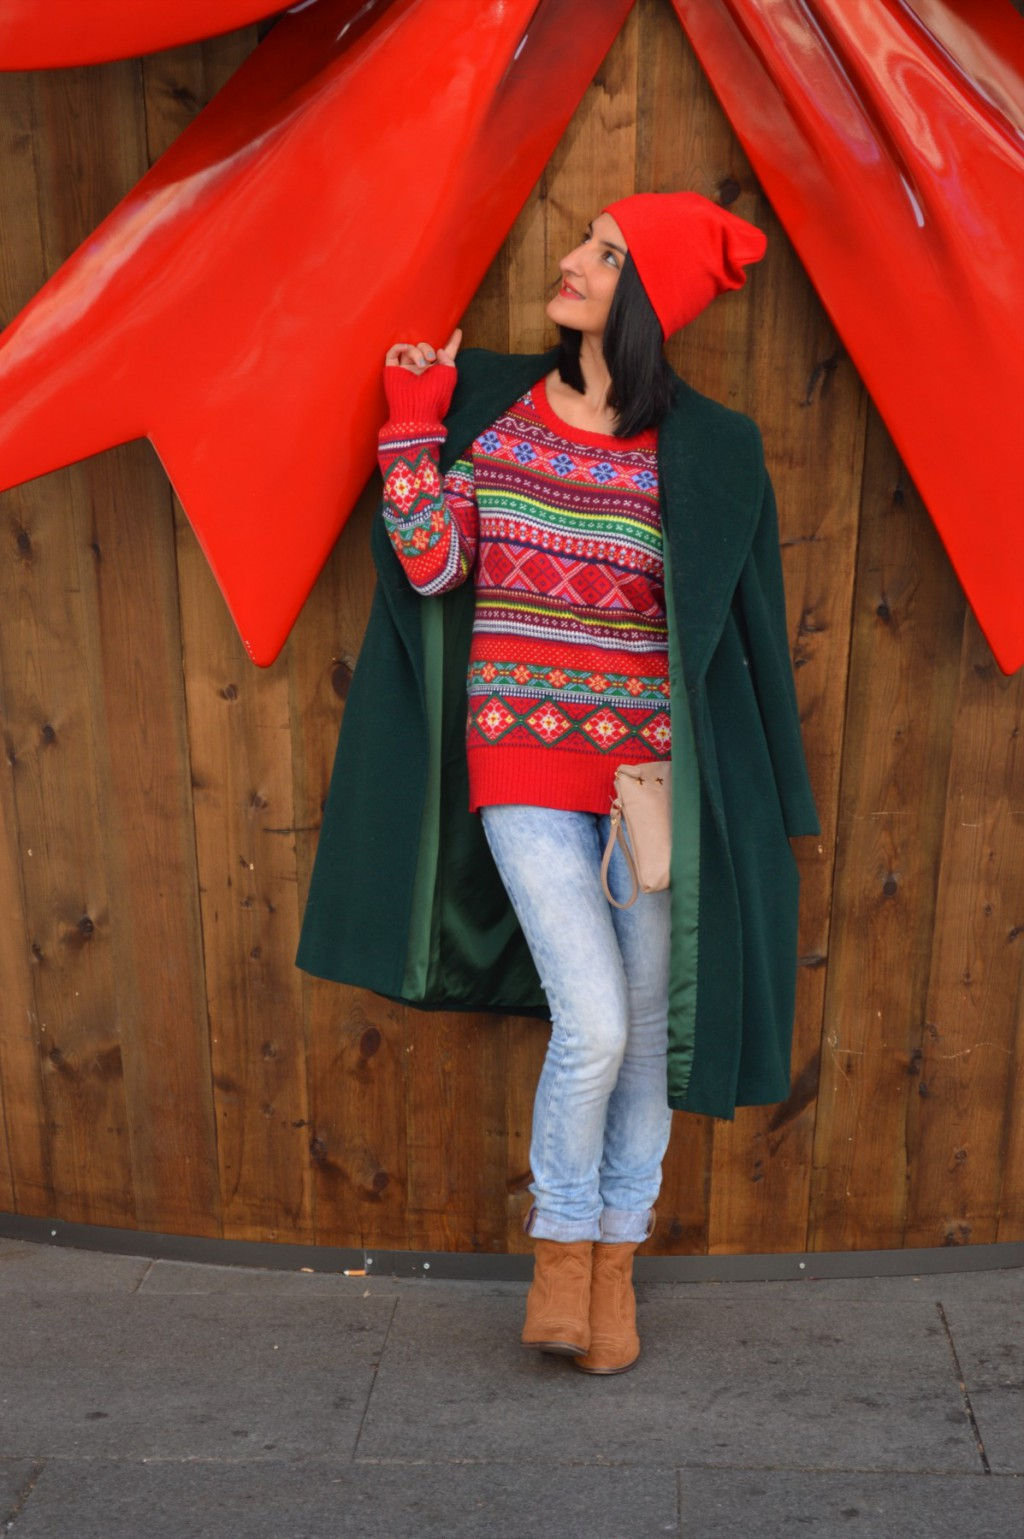 Abrigo / coat: Vintage Jersey: H&M (New) Gorro / beanie: H&M Jens: Salsa jeans Botines / booties: Bershka Clutch: Suiteblanco